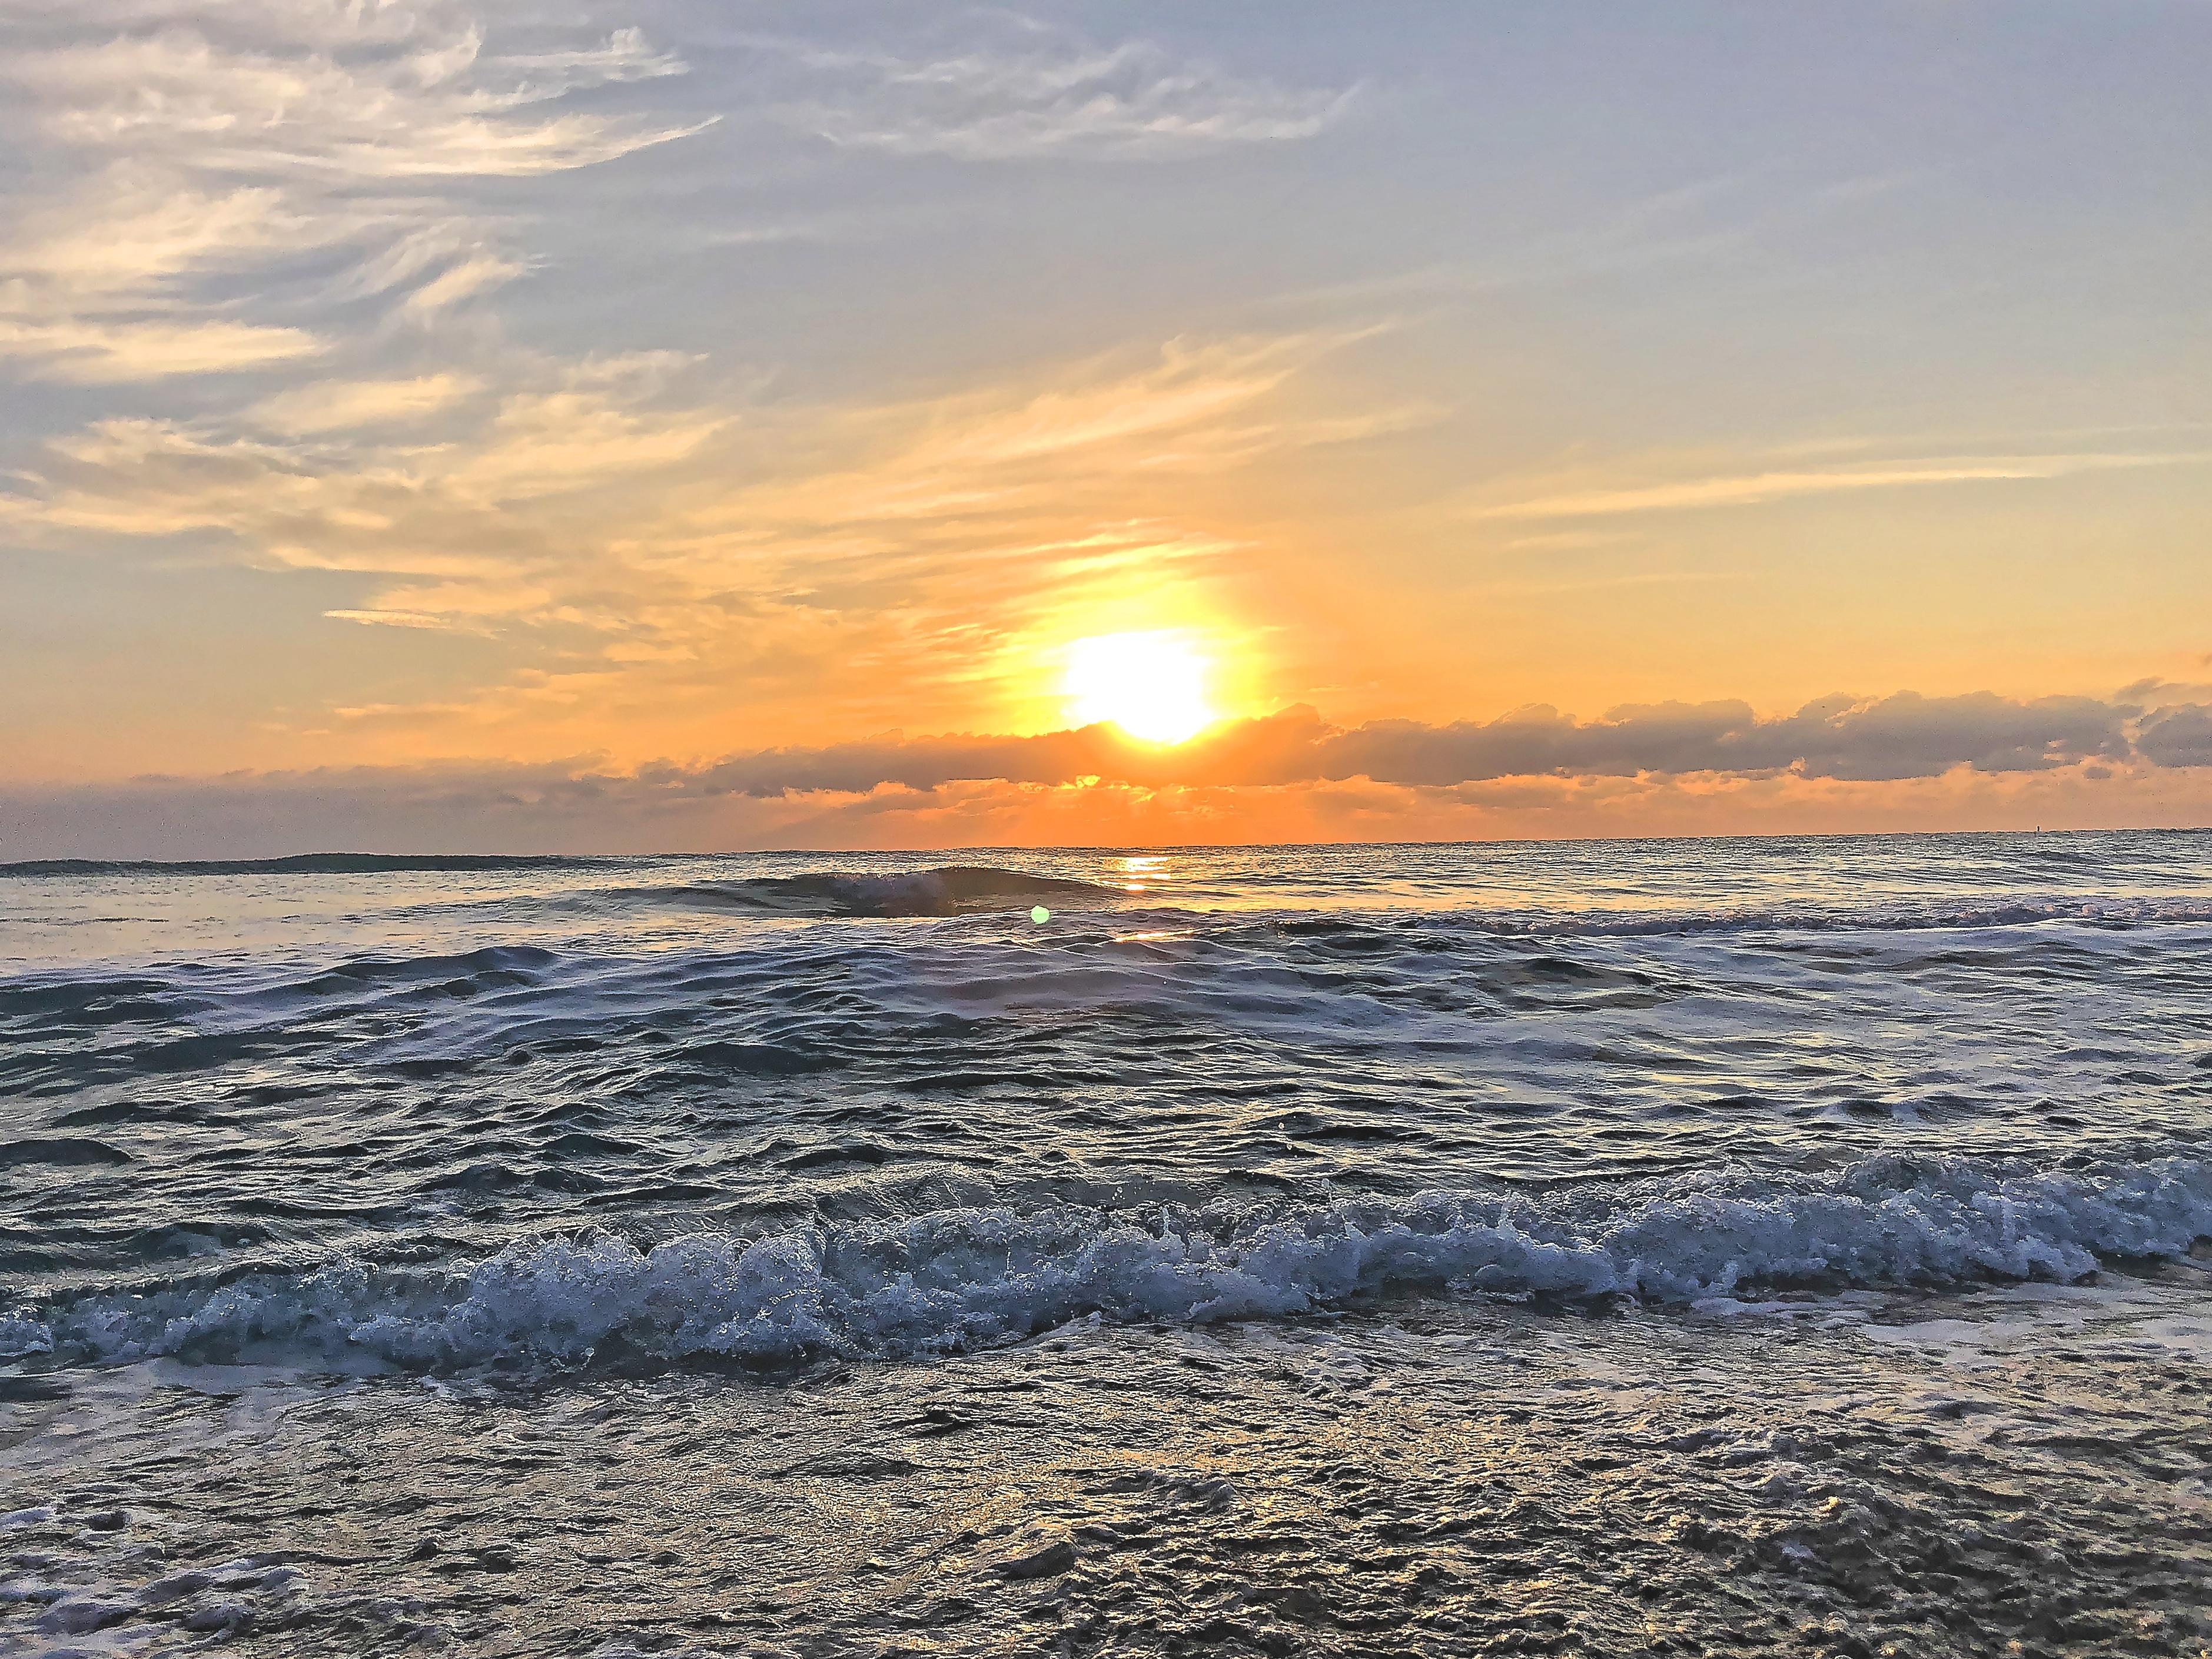 bird flying on the beach at sunrise